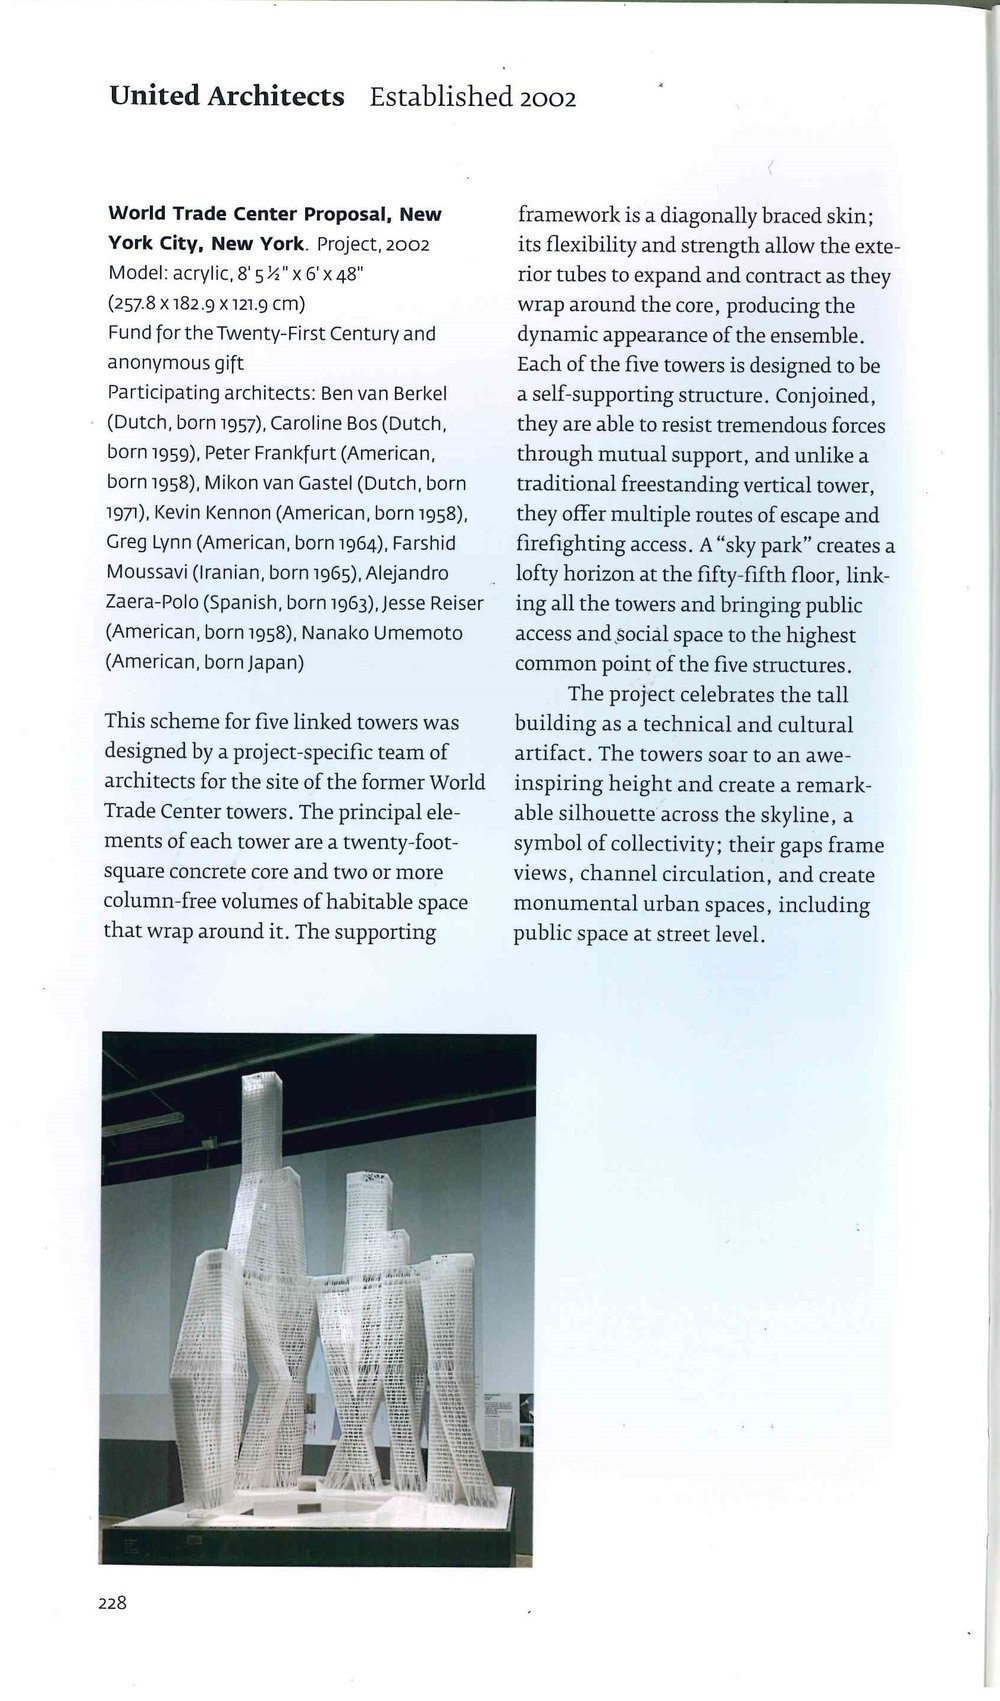 MOMA Article.jpg